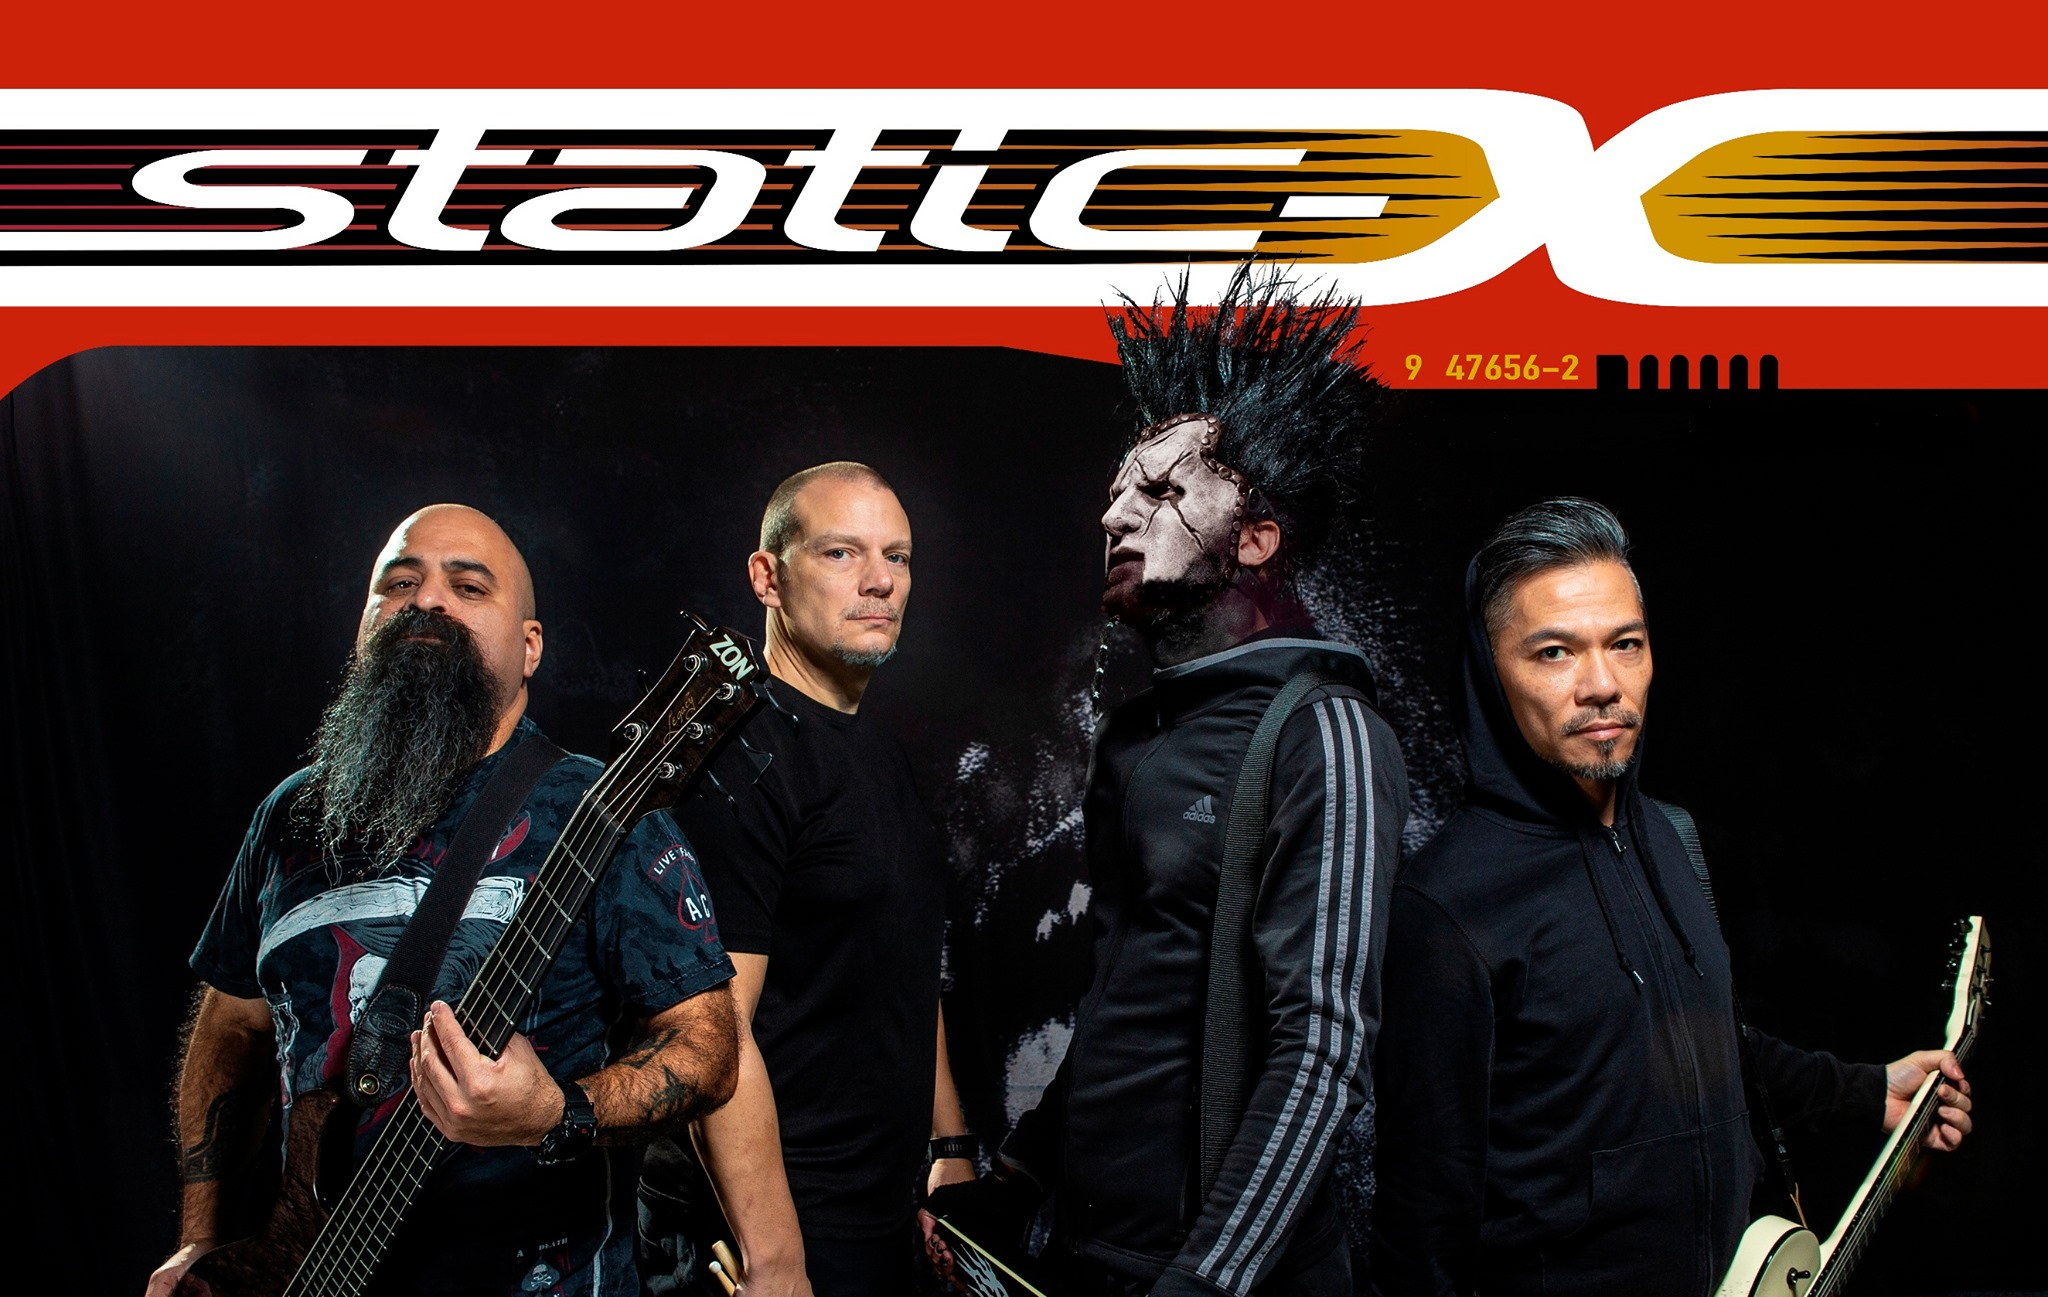 Static-X [USA] Dope [USA] Rīgā!